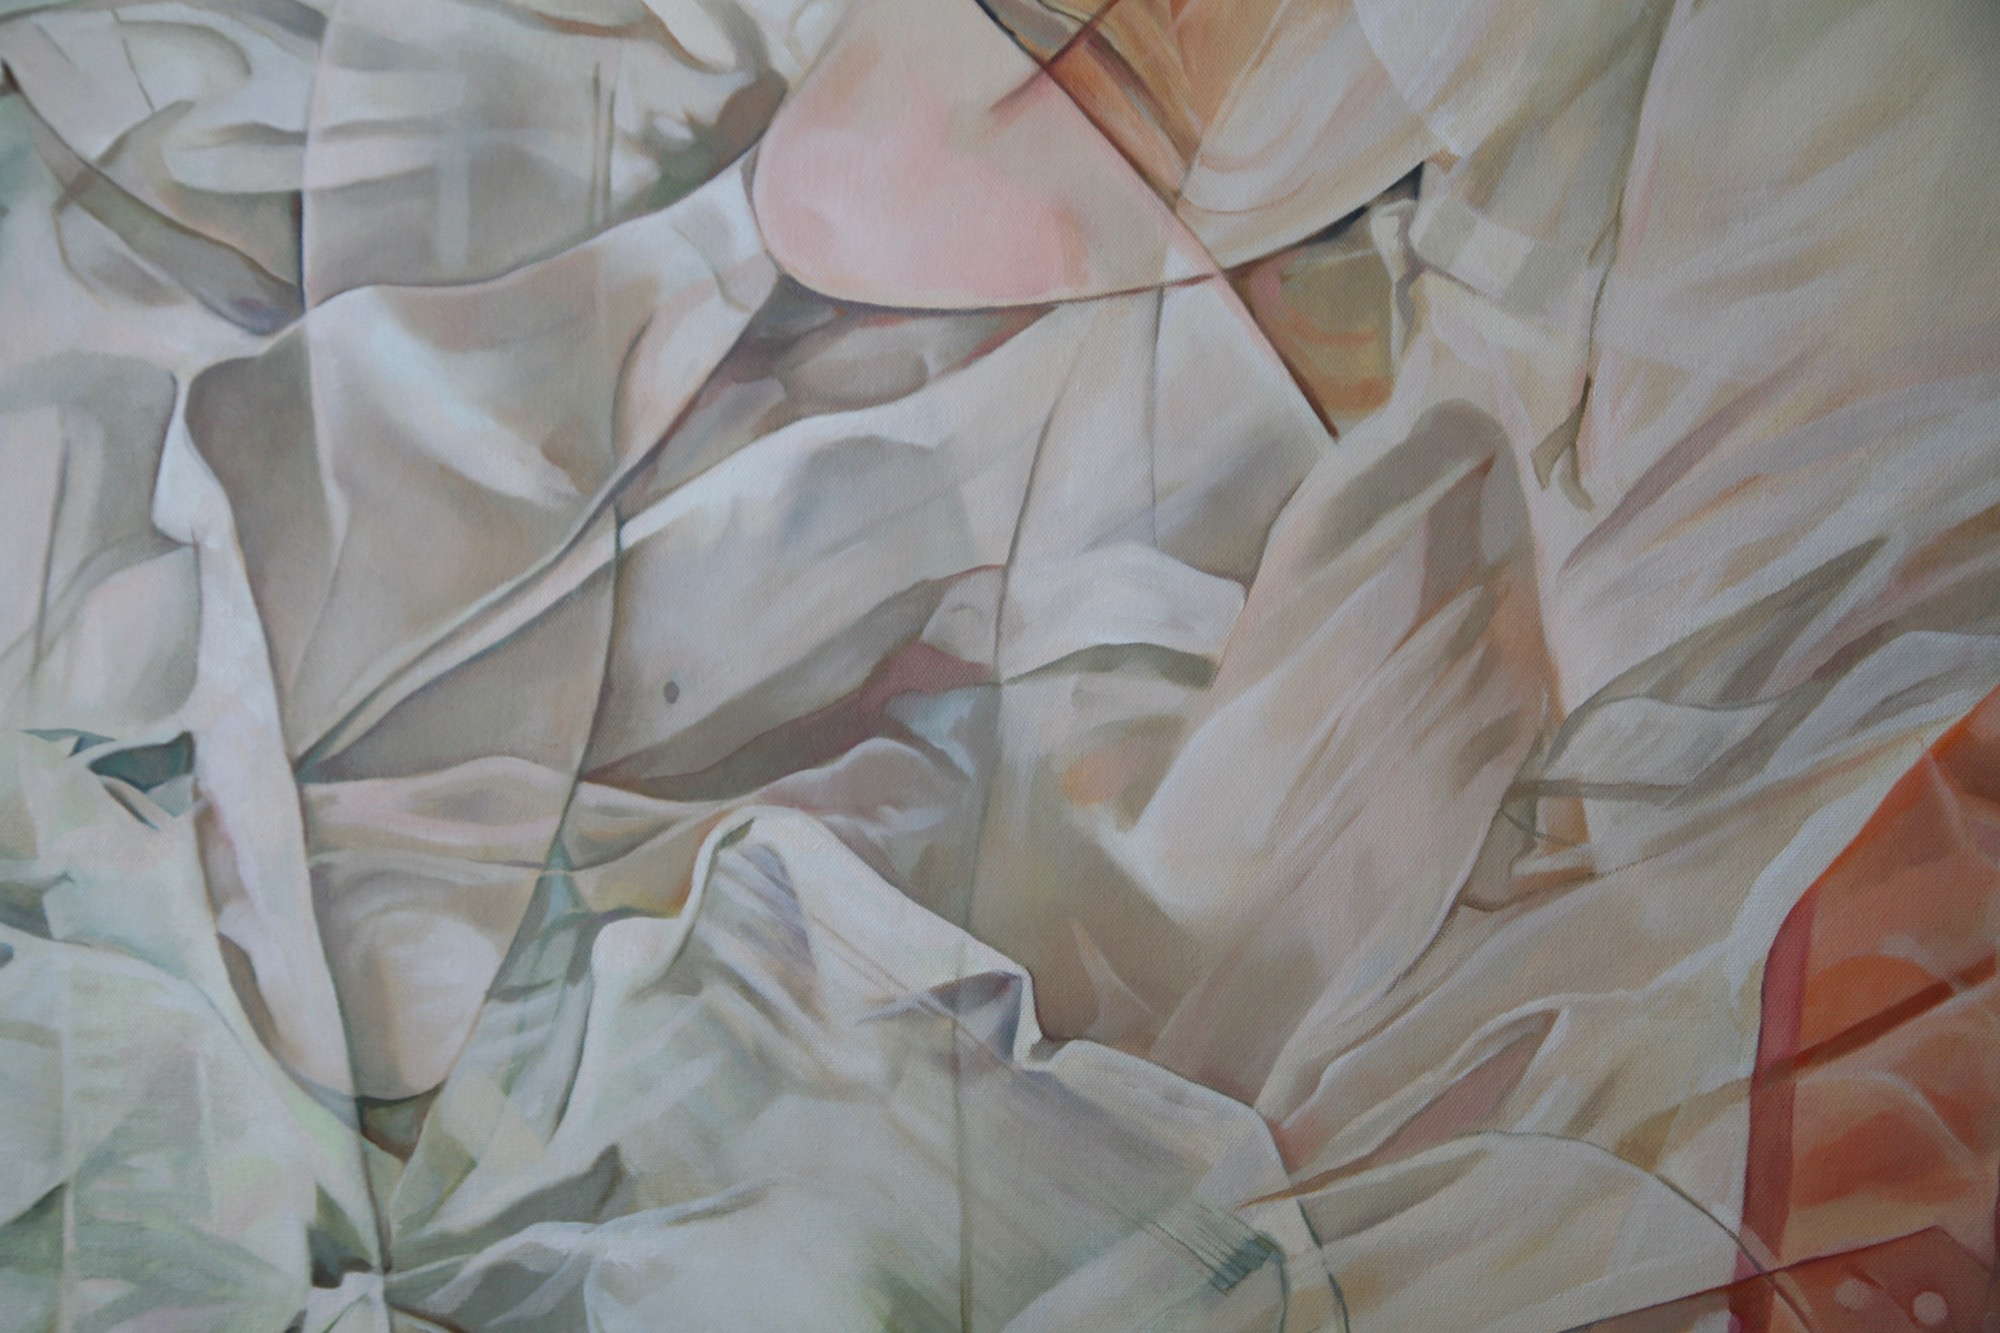 Jenna L H Grotelueschen - Untitled